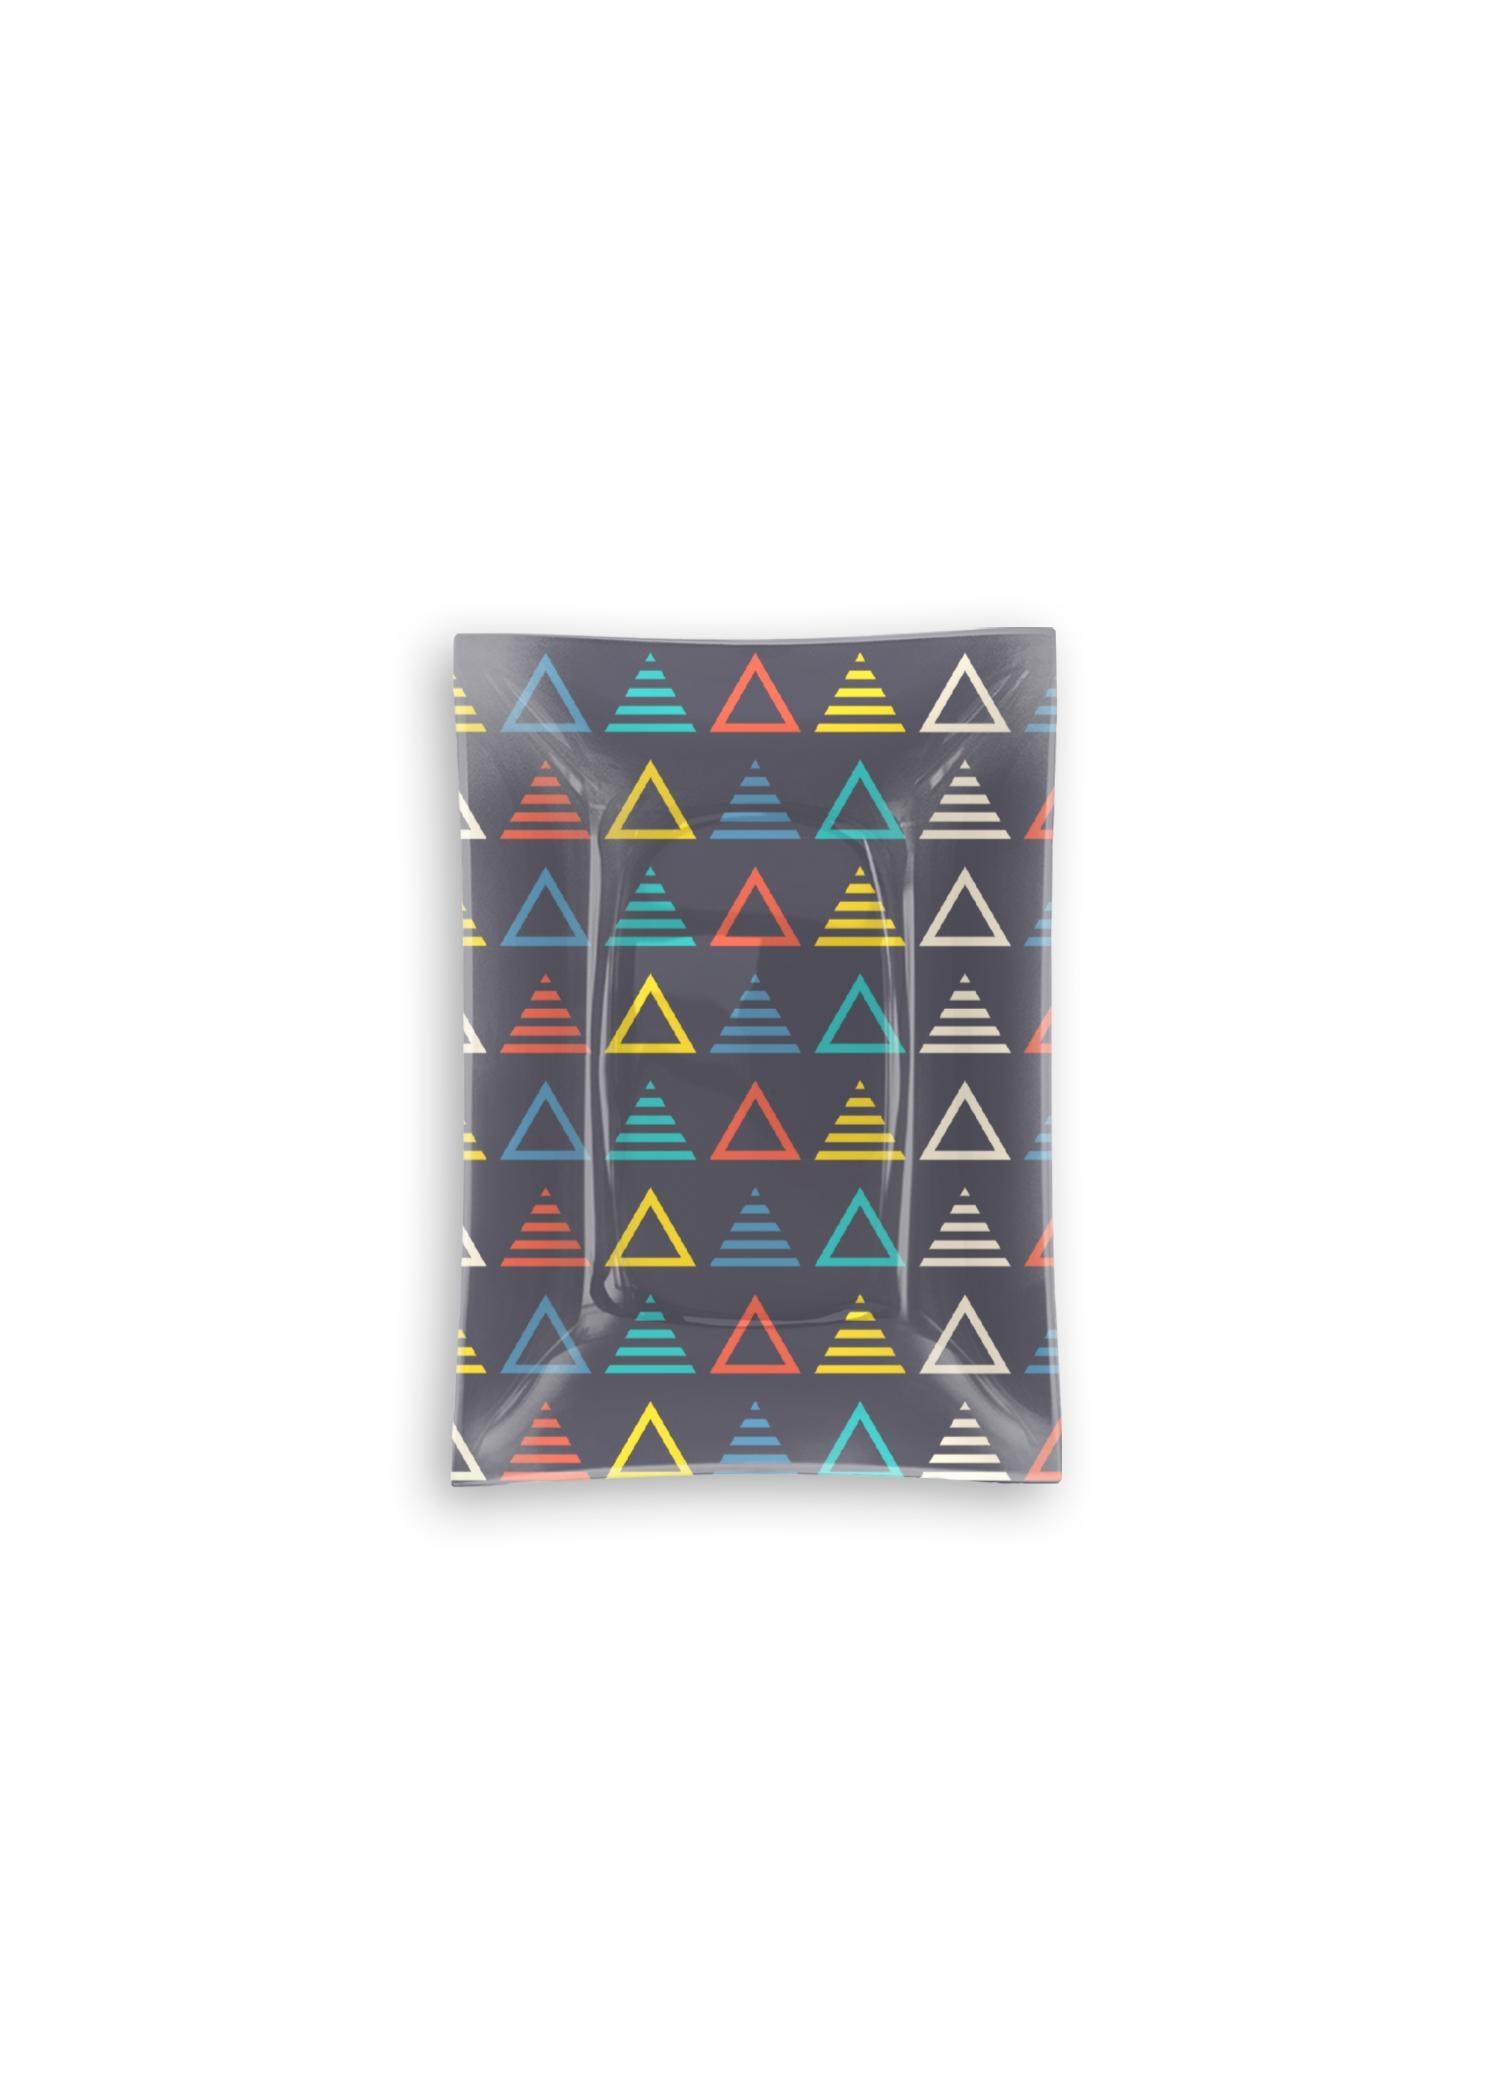 VIDA Oblong Glass Tray - Music Symmetric Triangle by VIDA Original Artist  - Size: Small